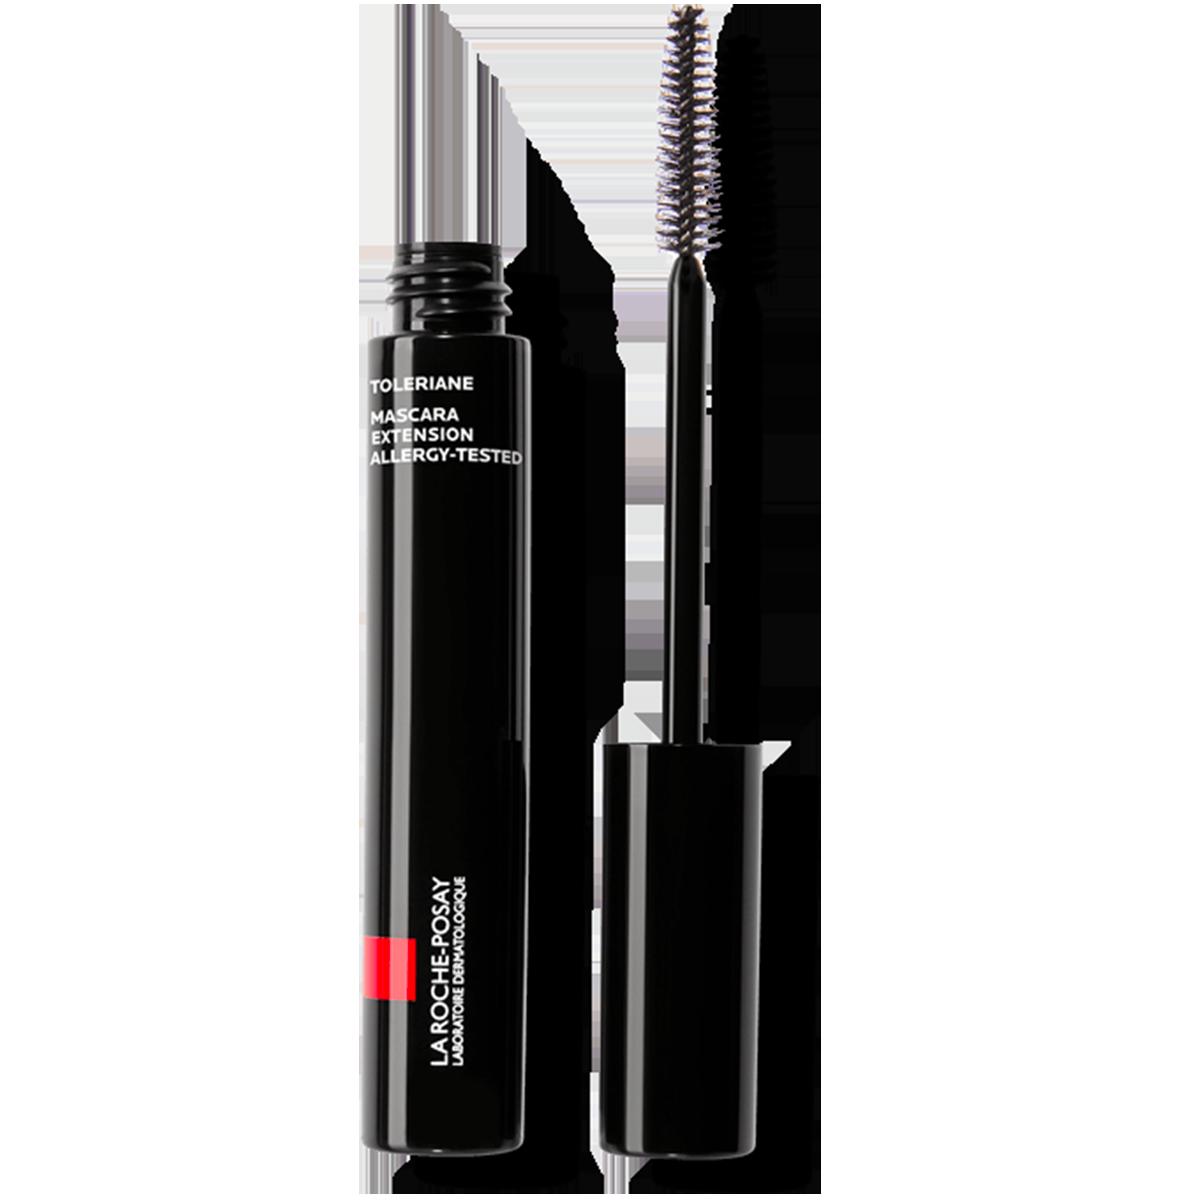 La Roche Posay Herkkä Toleriane Make up EXTENSION MASCARA Black 333